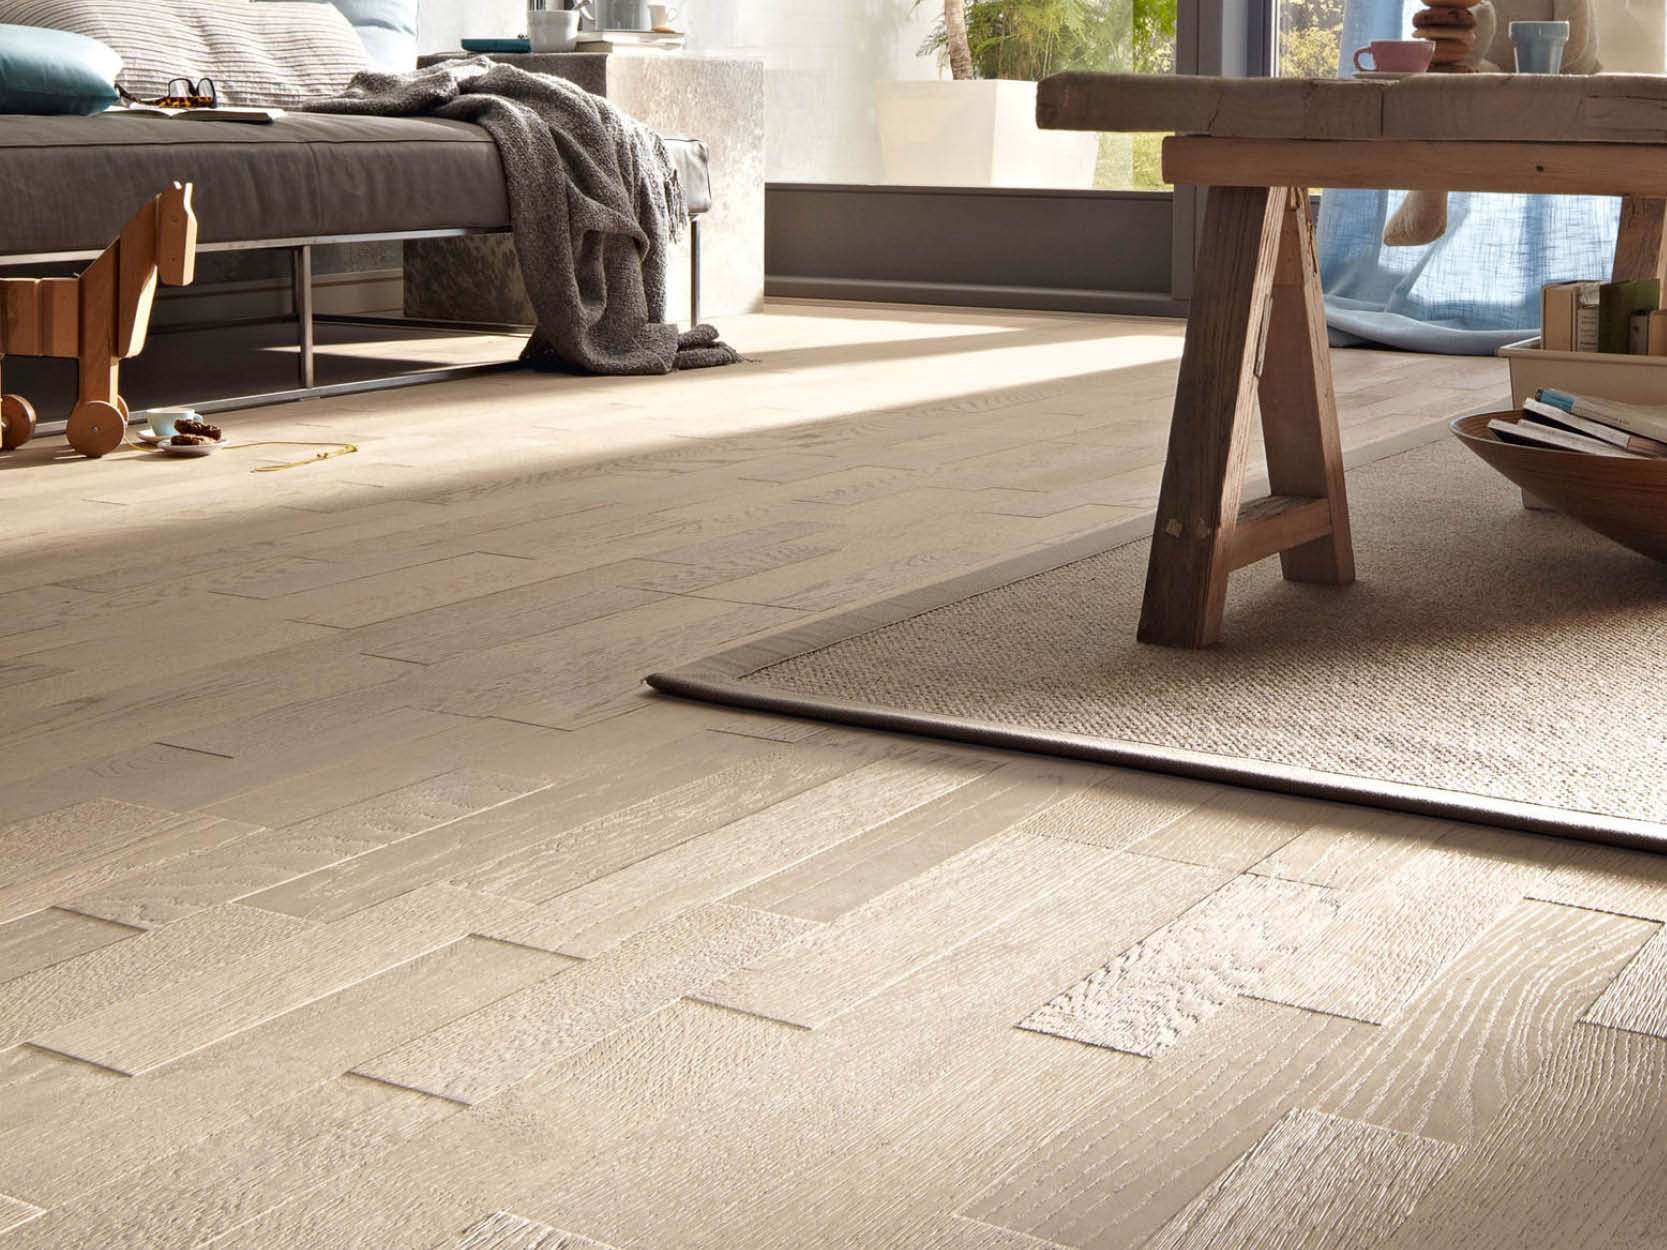 Meister's Engineered Oak 3D Planked Parquet